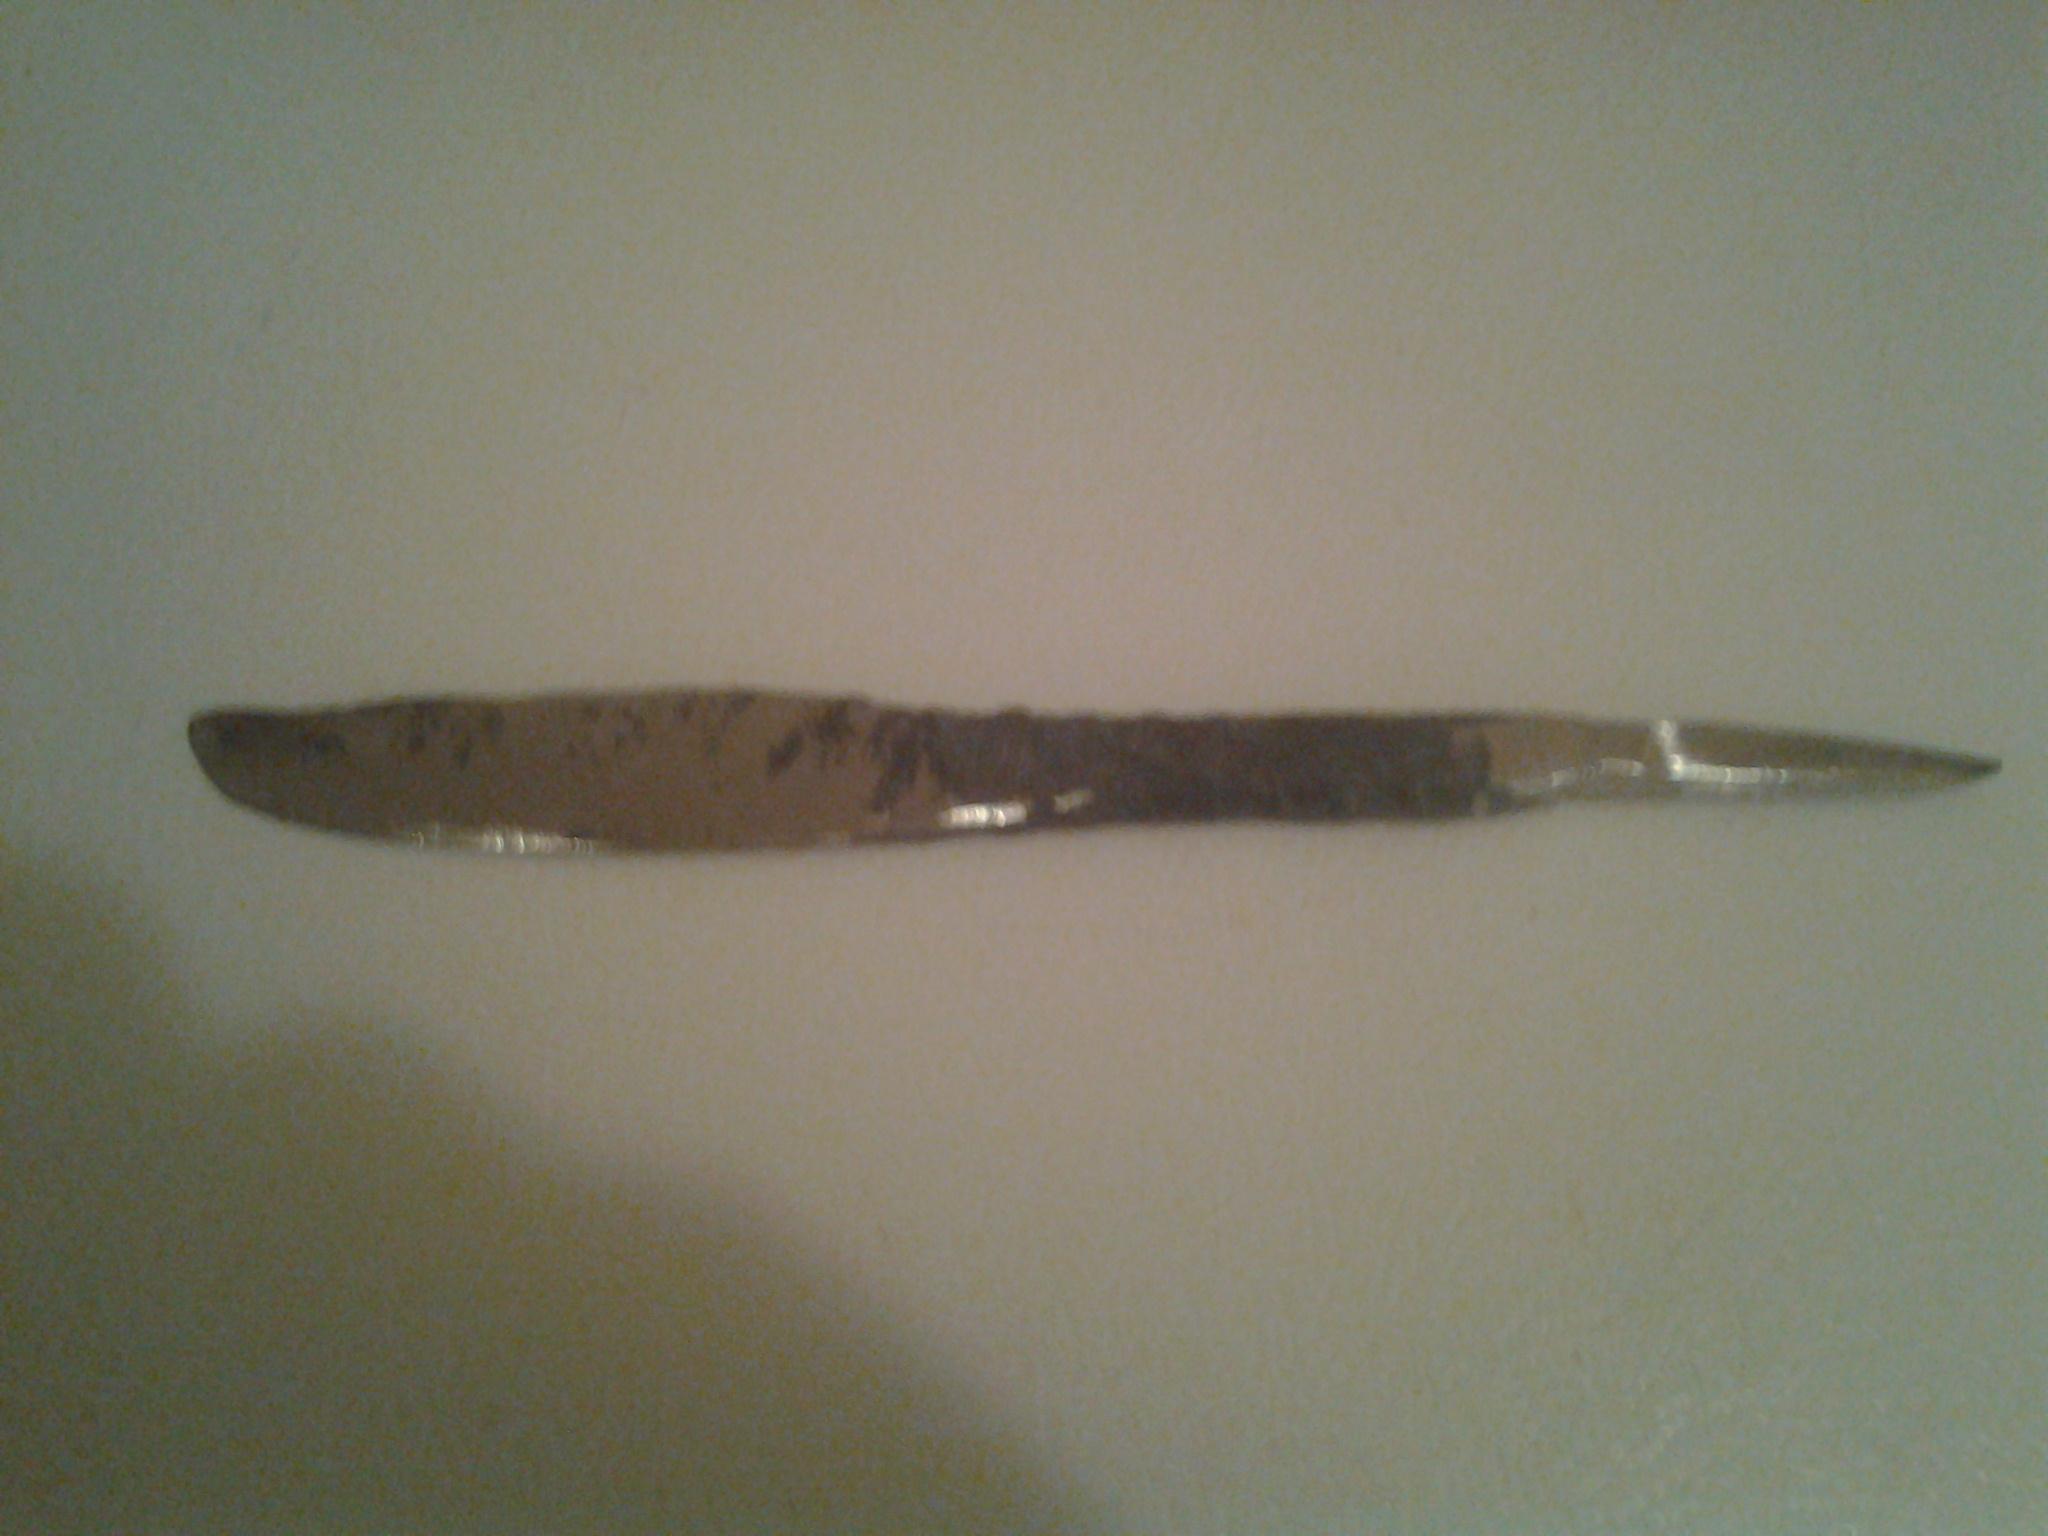 Rebar knife